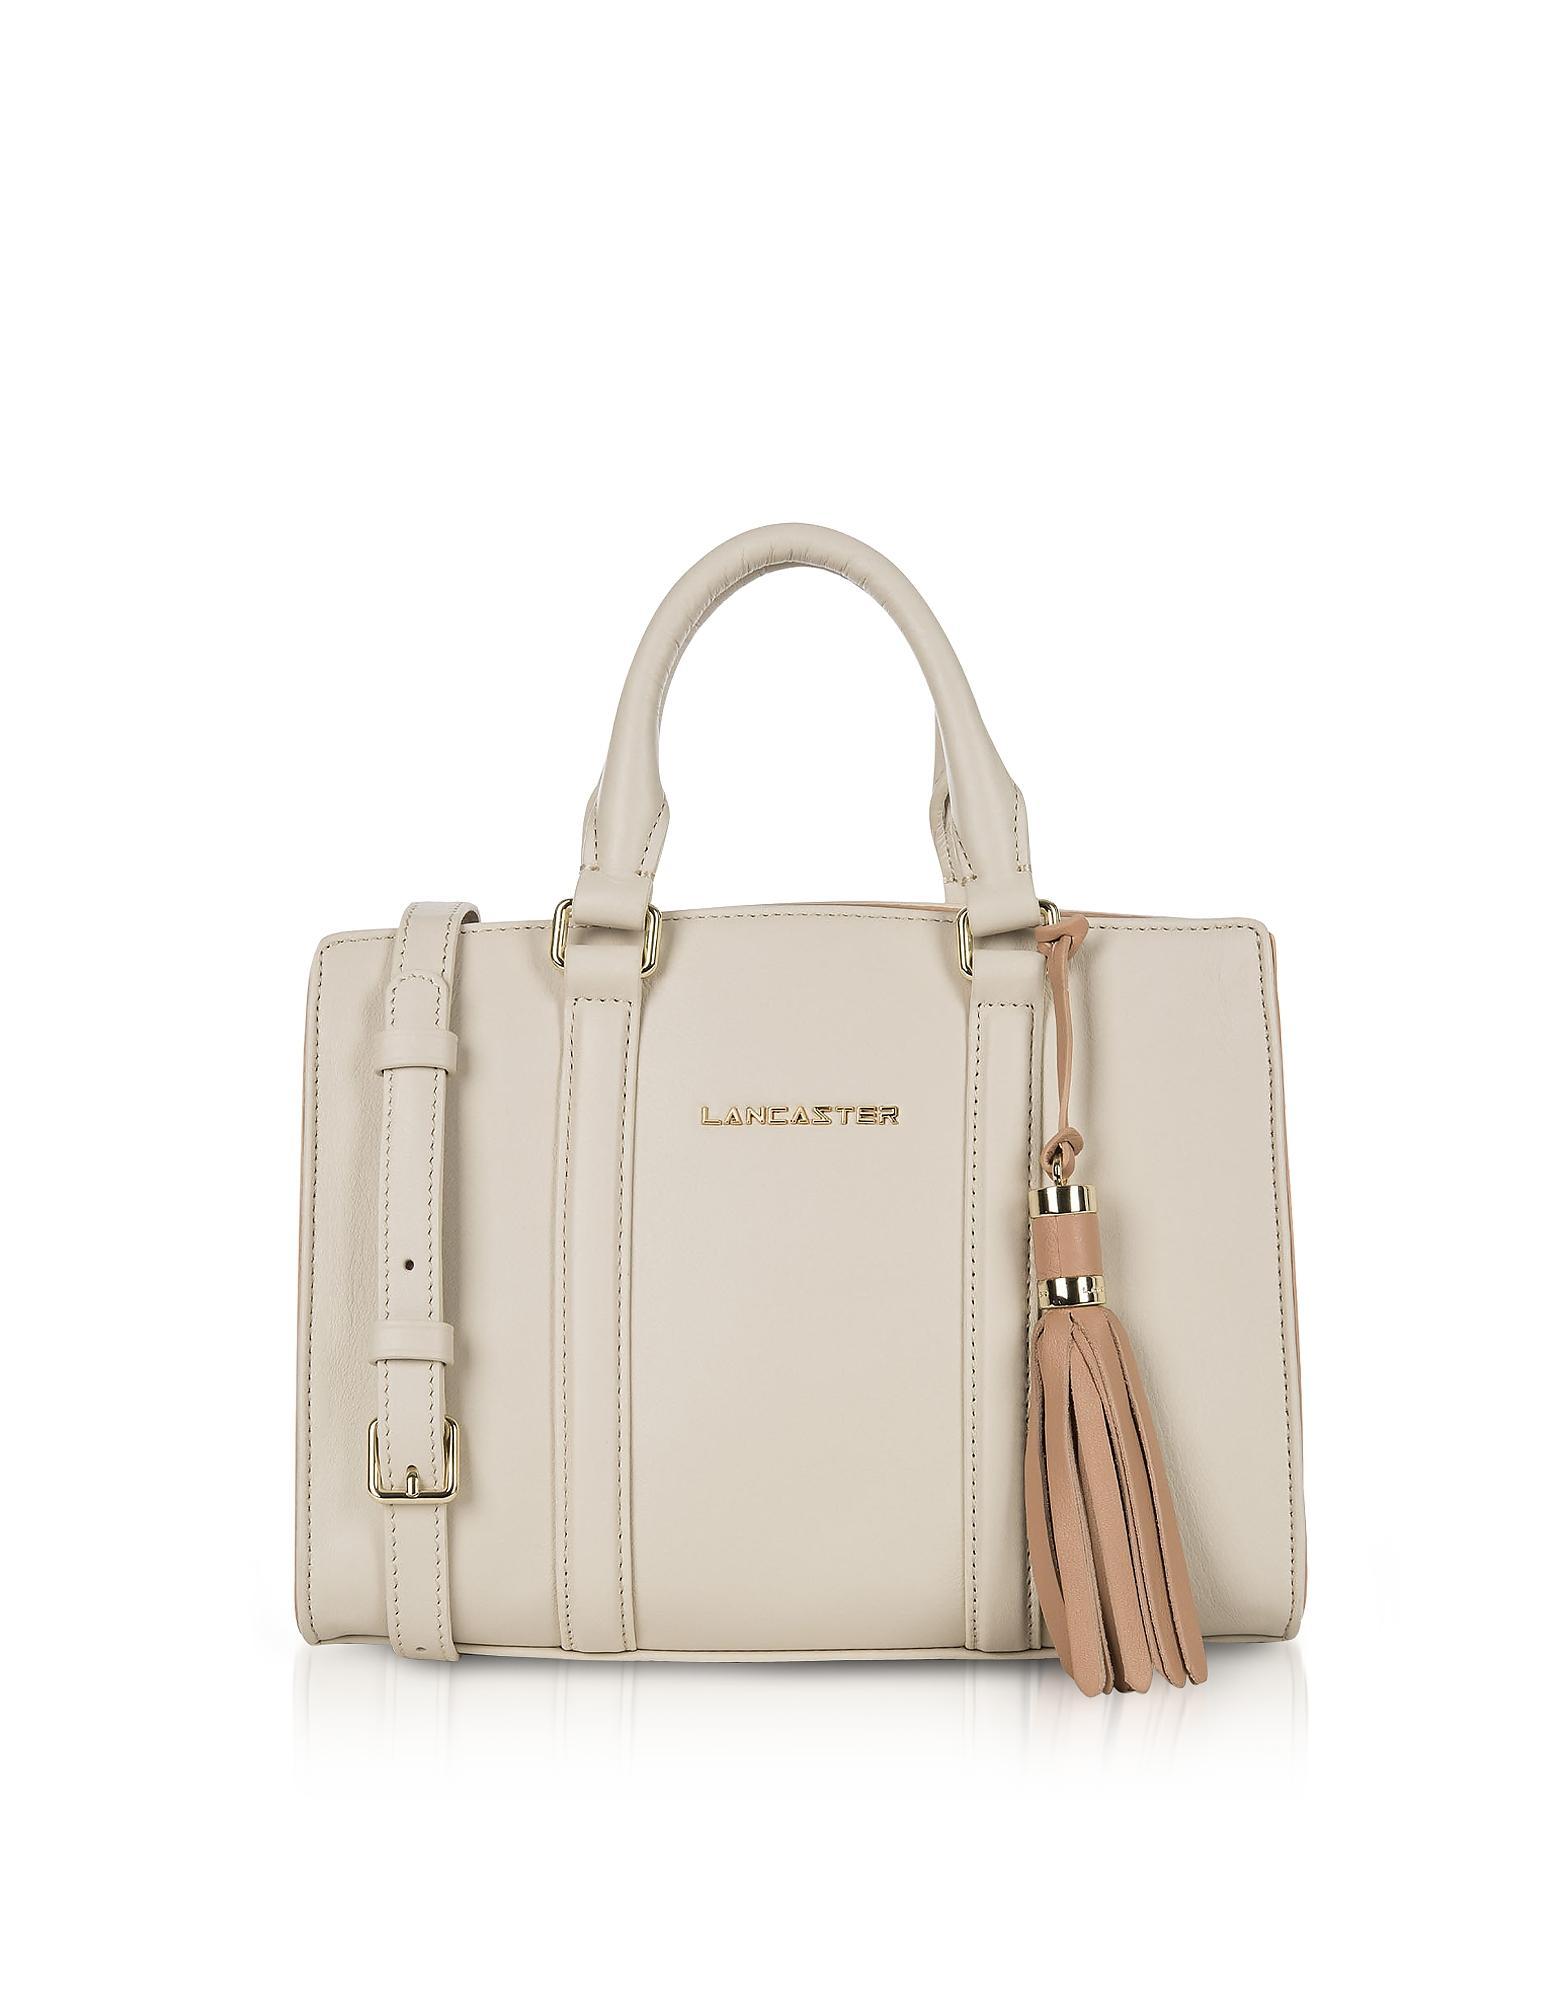 fd33c4894b8784 Lancaster Mademoiselle Ana Beige/Nude Leather Small Satchel Bag ...